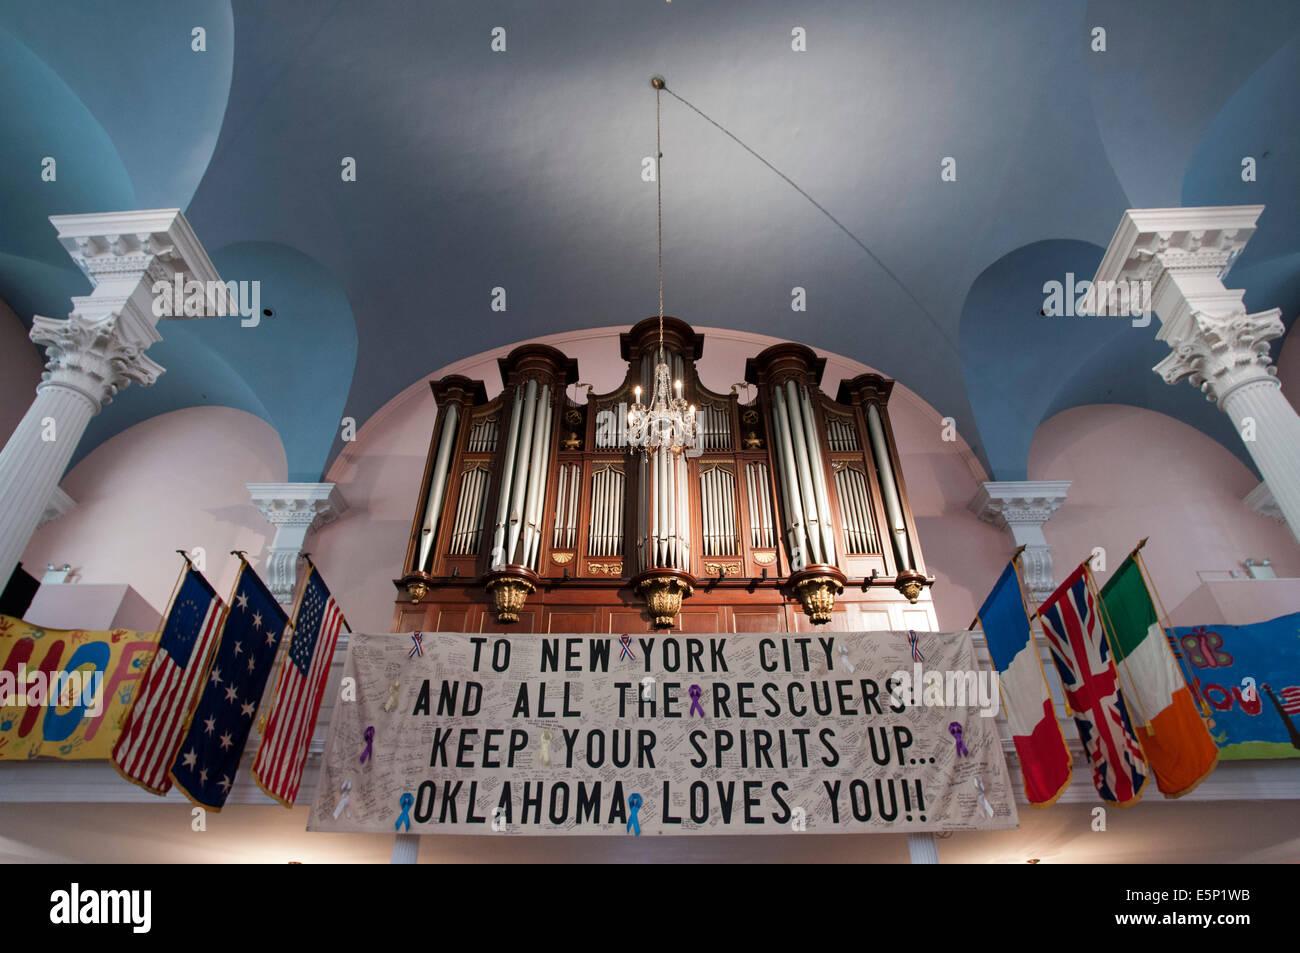 St Paul's chapel, Manhattan, New York City, New York, United States of America, North America. Inside the chapel - Stock Image